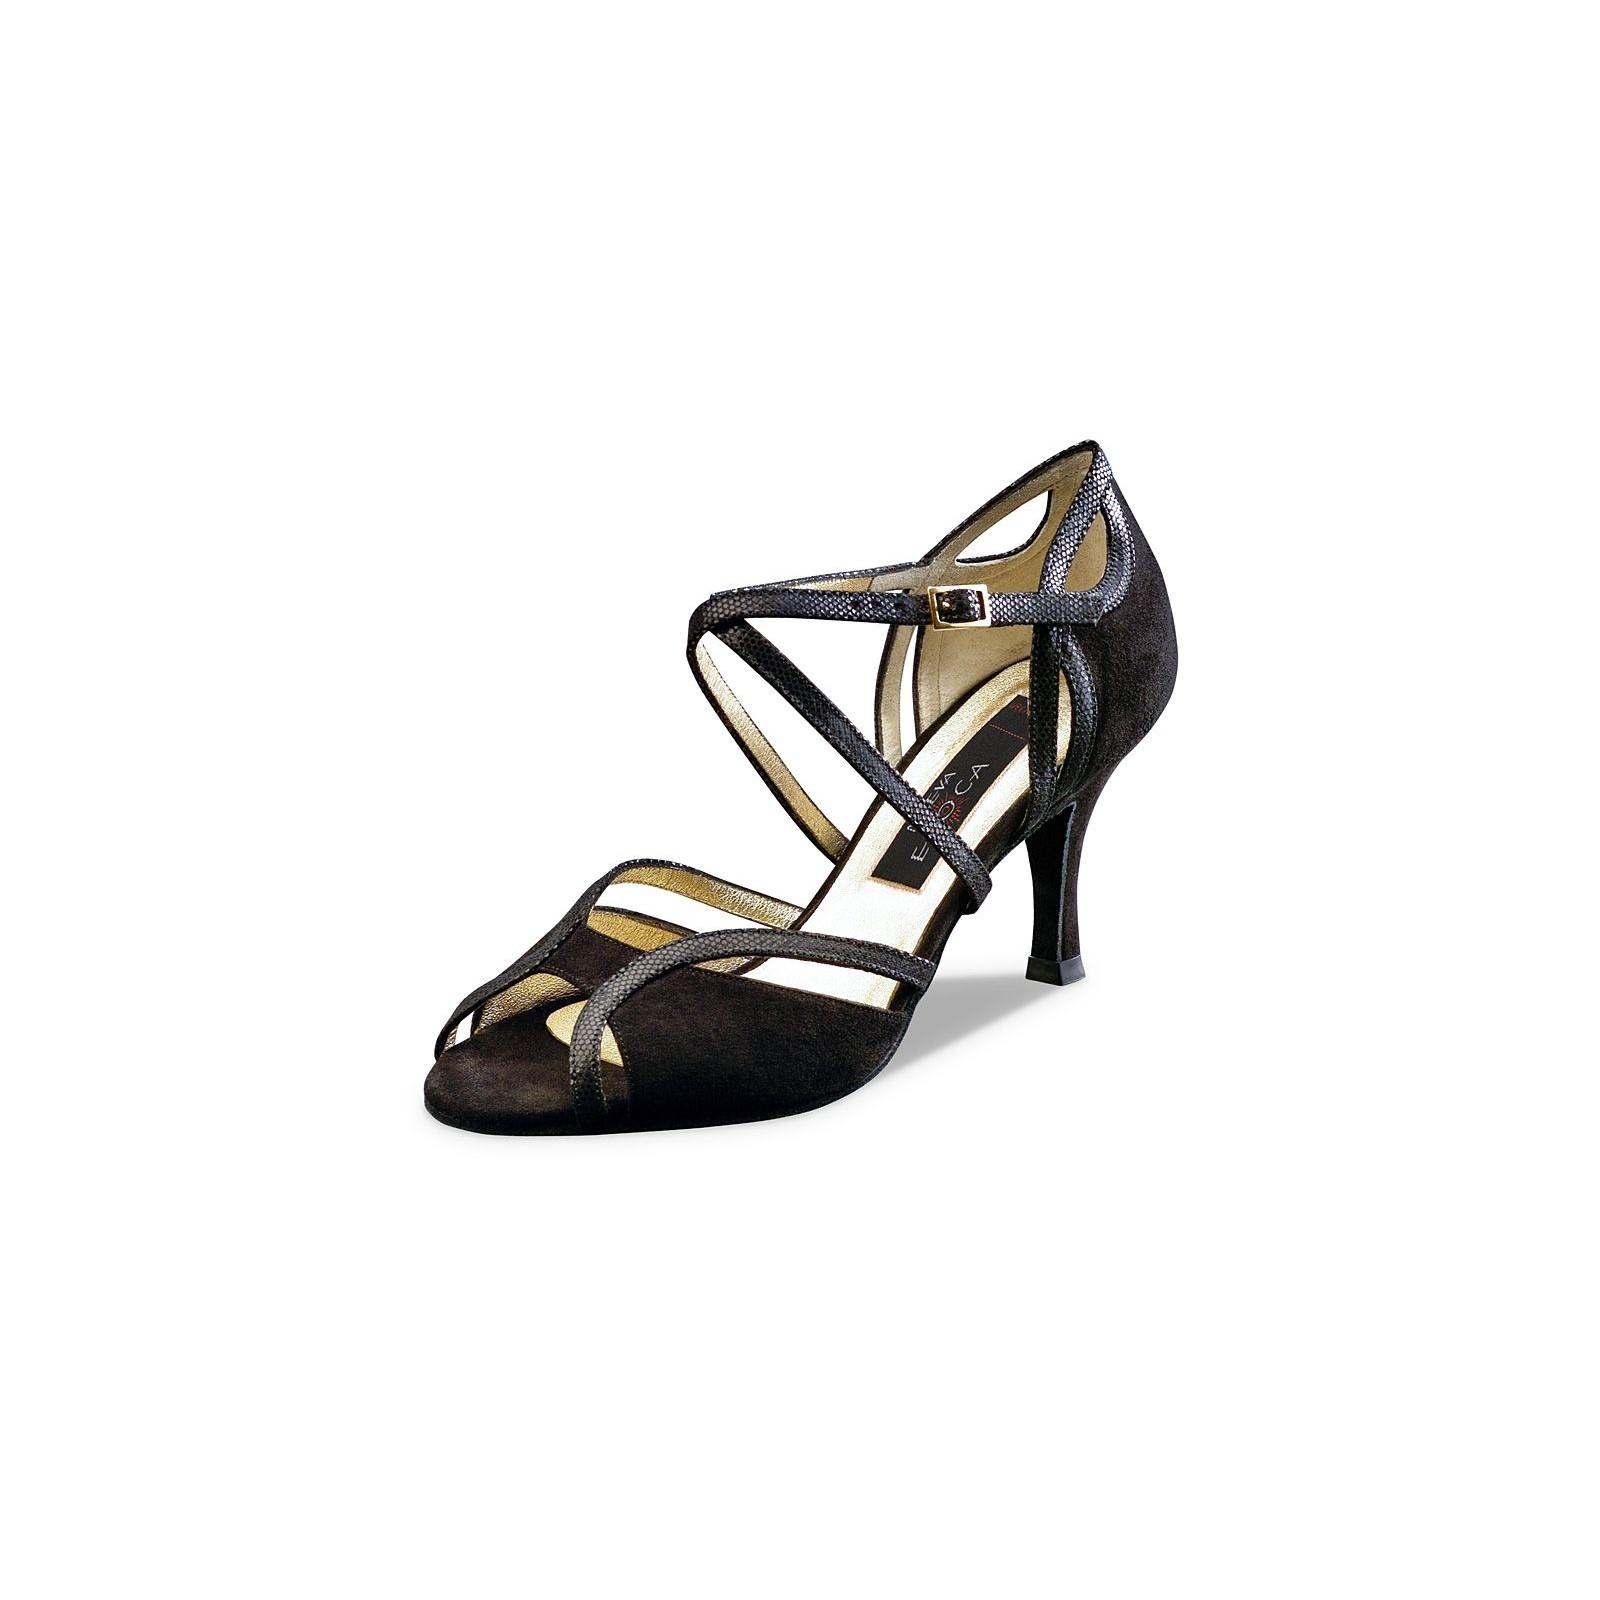 De Bachata De Bachata Femme Femme Chaussure Chaussure qMGUzVLSp